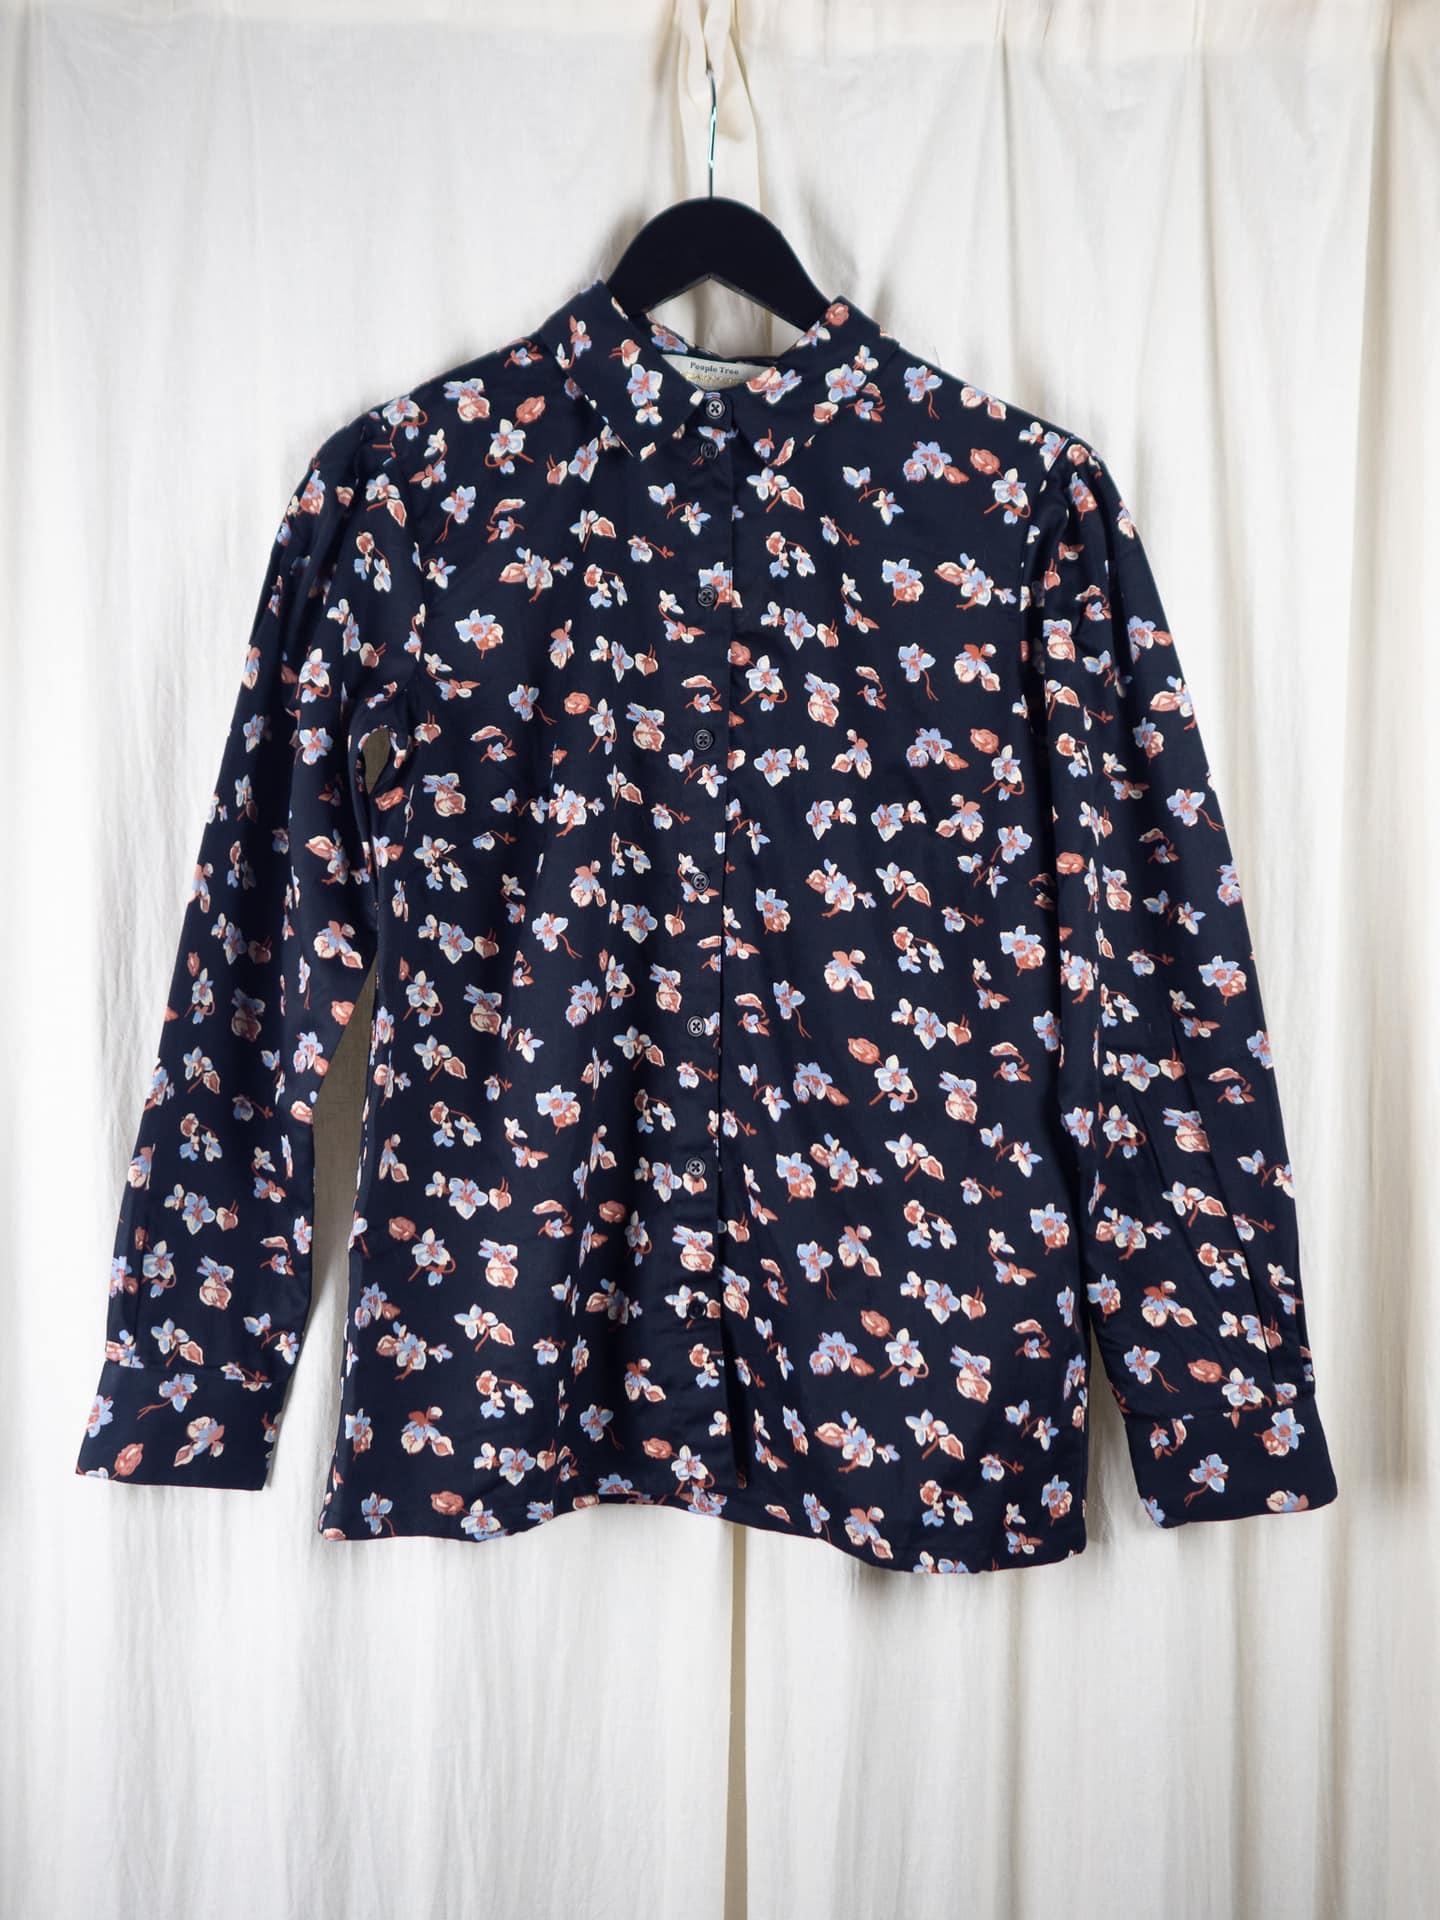 Edie floral shirt